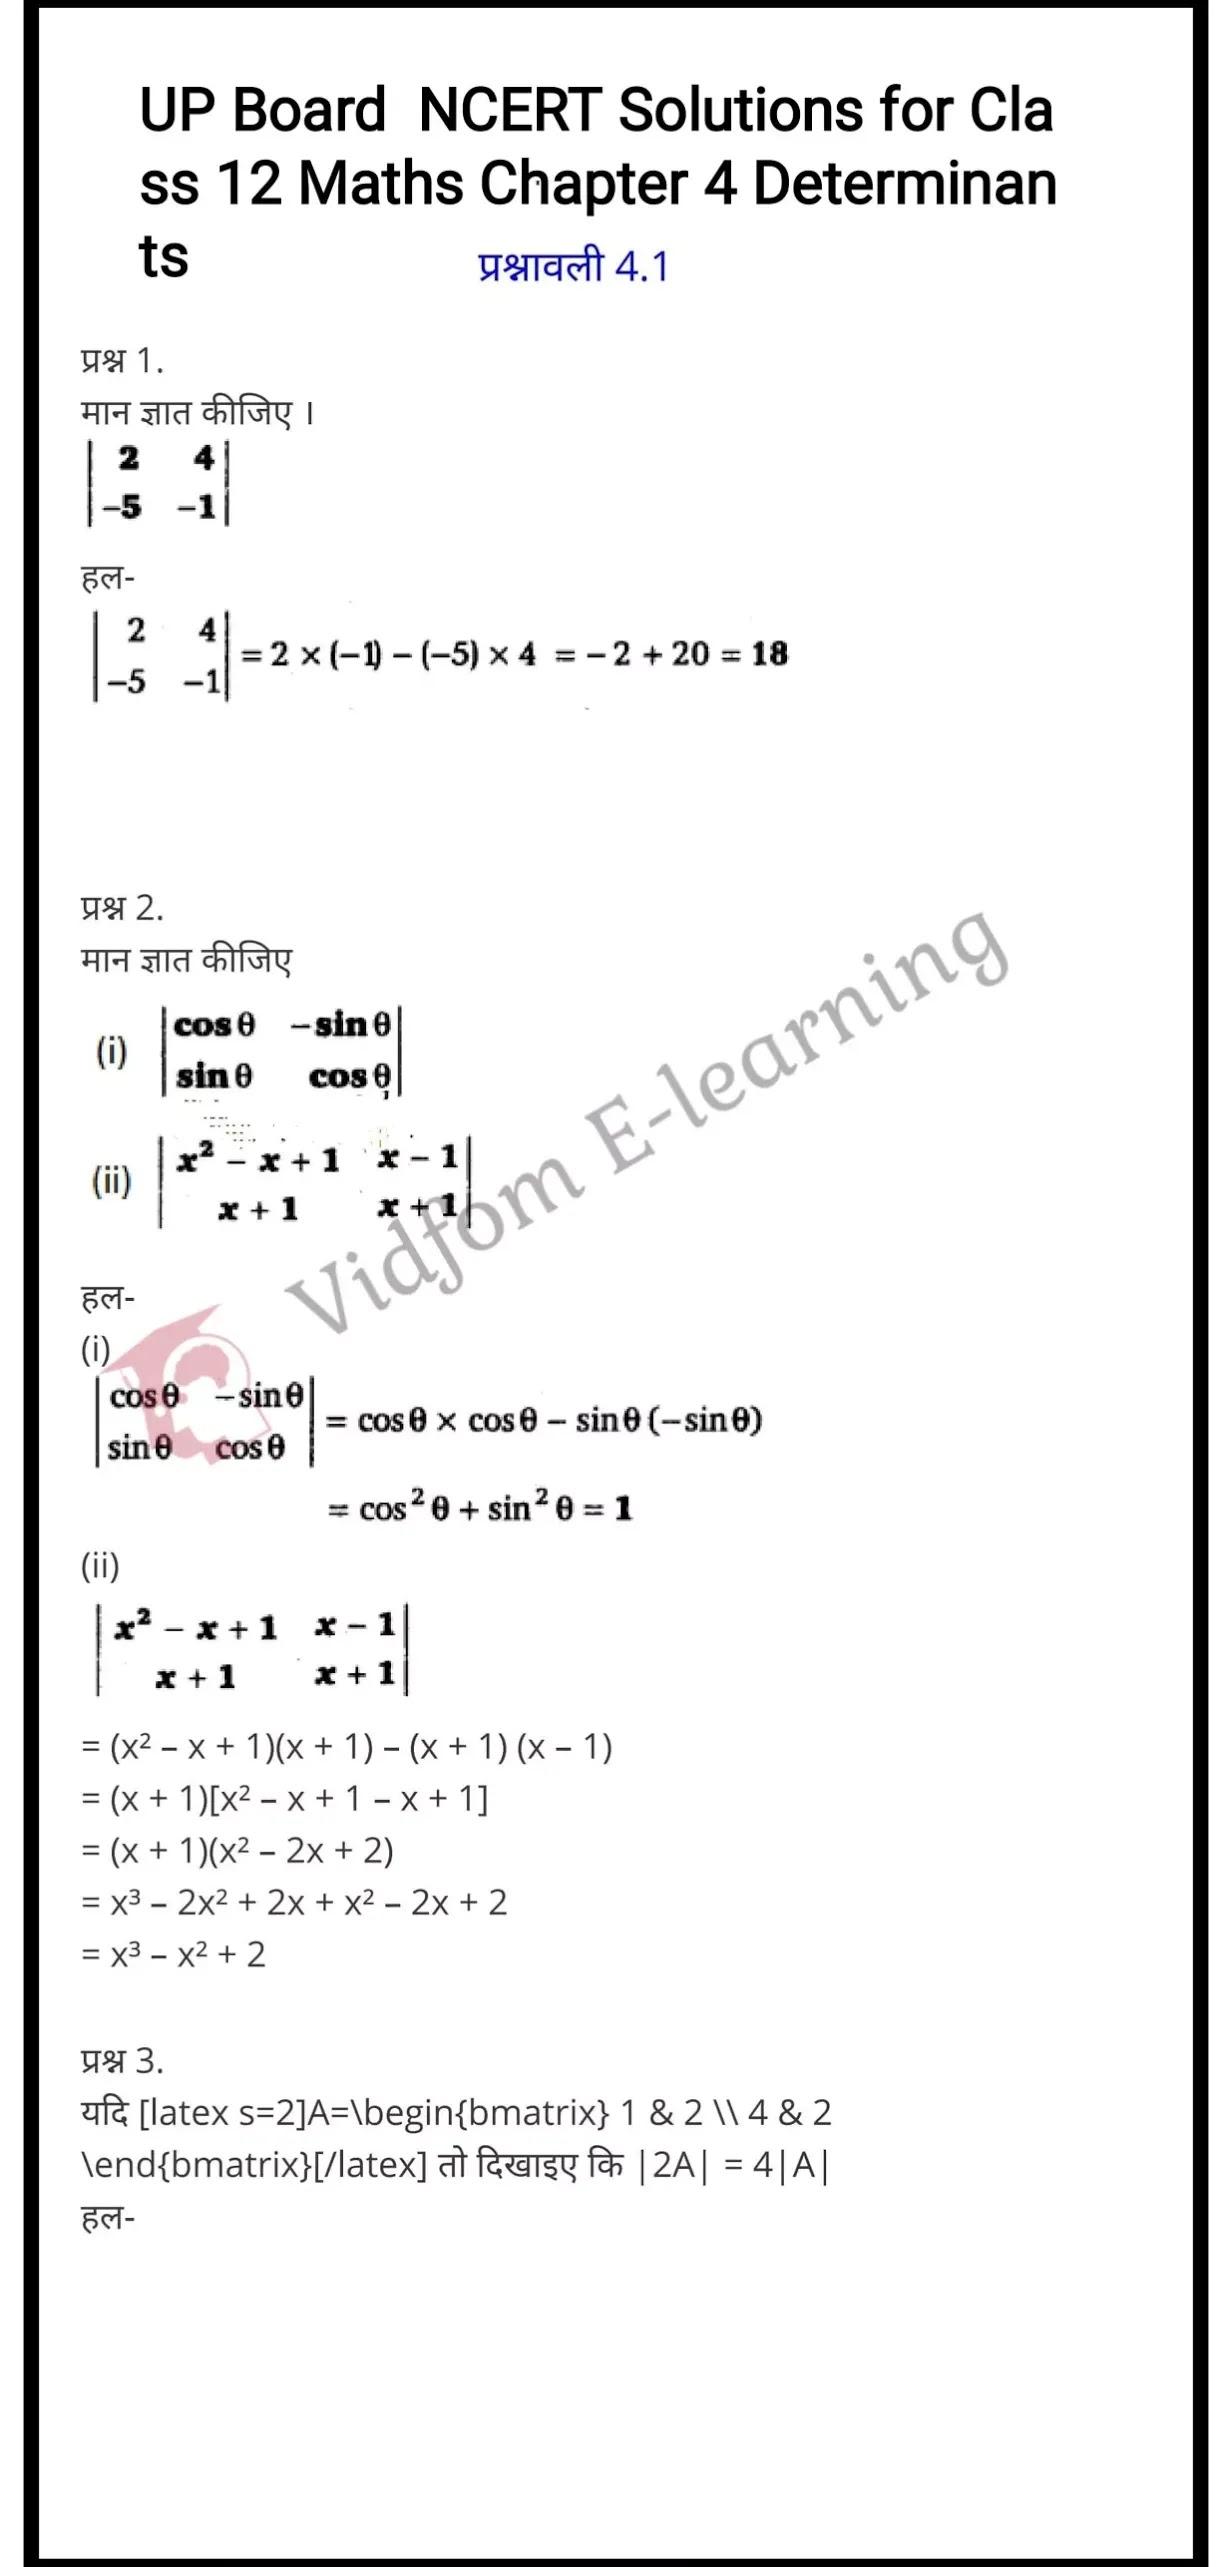 कक्षा 12 गणित  के नोट्स  हिंदी में एनसीईआरटी समाधान,     class 12 Maths Chapter 4,   class 12 Maths Chapter 4 ncert solutions in Hindi,   class 12 Maths Chapter 4 notes in hindi,   class 12 Maths Chapter 4 question answer,   class 12 Maths Chapter 4 notes,   class 12 Maths Chapter 4 class 12 Maths Chapter 4 in  hindi,    class 12 Maths Chapter 4 important questions in  hindi,   class 12 Maths Chapter 4 notes in hindi,    class 12 Maths Chapter 4 test,   class 12 Maths Chapter 4 pdf,   class 12 Maths Chapter 4 notes pdf,   class 12 Maths Chapter 4 exercise solutions,   class 12 Maths Chapter 4 notes study rankers,   class 12 Maths Chapter 4 notes,    class 12 Maths Chapter 4  class 12  notes pdf,   class 12 Maths Chapter 4 class 12  notes  ncert,   class 12 Maths Chapter 4 class 12 pdf,   class 12 Maths Chapter 4  book,   class 12 Maths Chapter 4 quiz class 12  ,    10  th class 12 Maths Chapter 4  book up board,   up board 10  th class 12 Maths Chapter 4 notes,  class 12 Maths,   class 12 Maths ncert solutions in Hindi,   class 12 Maths notes in hindi,   class 12 Maths question answer,   class 12 Maths notes,  class 12 Maths class 12 Maths Chapter 4 in  hindi,    class 12 Maths important questions in  hindi,   class 12 Maths notes in hindi,    class 12 Maths test,  class 12 Maths class 12 Maths Chapter 4 pdf,   class 12 Maths notes pdf,   class 12 Maths exercise solutions,   class 12 Maths,  class 12 Maths notes study rankers,   class 12 Maths notes,  class 12 Maths notes,   class 12 Maths  class 12  notes pdf,   class 12 Maths class 12  notes  ncert,   class 12 Maths class 12 pdf,   class 12 Maths  book,  class 12 Maths quiz class 12  ,  10  th class 12 Maths    book up board,    up board 10  th class 12 Maths notes,      कक्षा 12 गणित अध्याय 4 ,  कक्षा 12 गणित, कक्षा 12 गणित अध्याय 4  के नोट्स हिंदी में,  कक्षा 12 का हिंदी अध्याय 4 का प्रश्न उत्तर,  कक्षा 12 गणित अध्याय 4 के नोट्स,  10 कक्षा गणित  हिंदी में, कक्षा 12 गणित अध्याय 4  हिंदी में,  कक्षा 12 गणित अध्याय